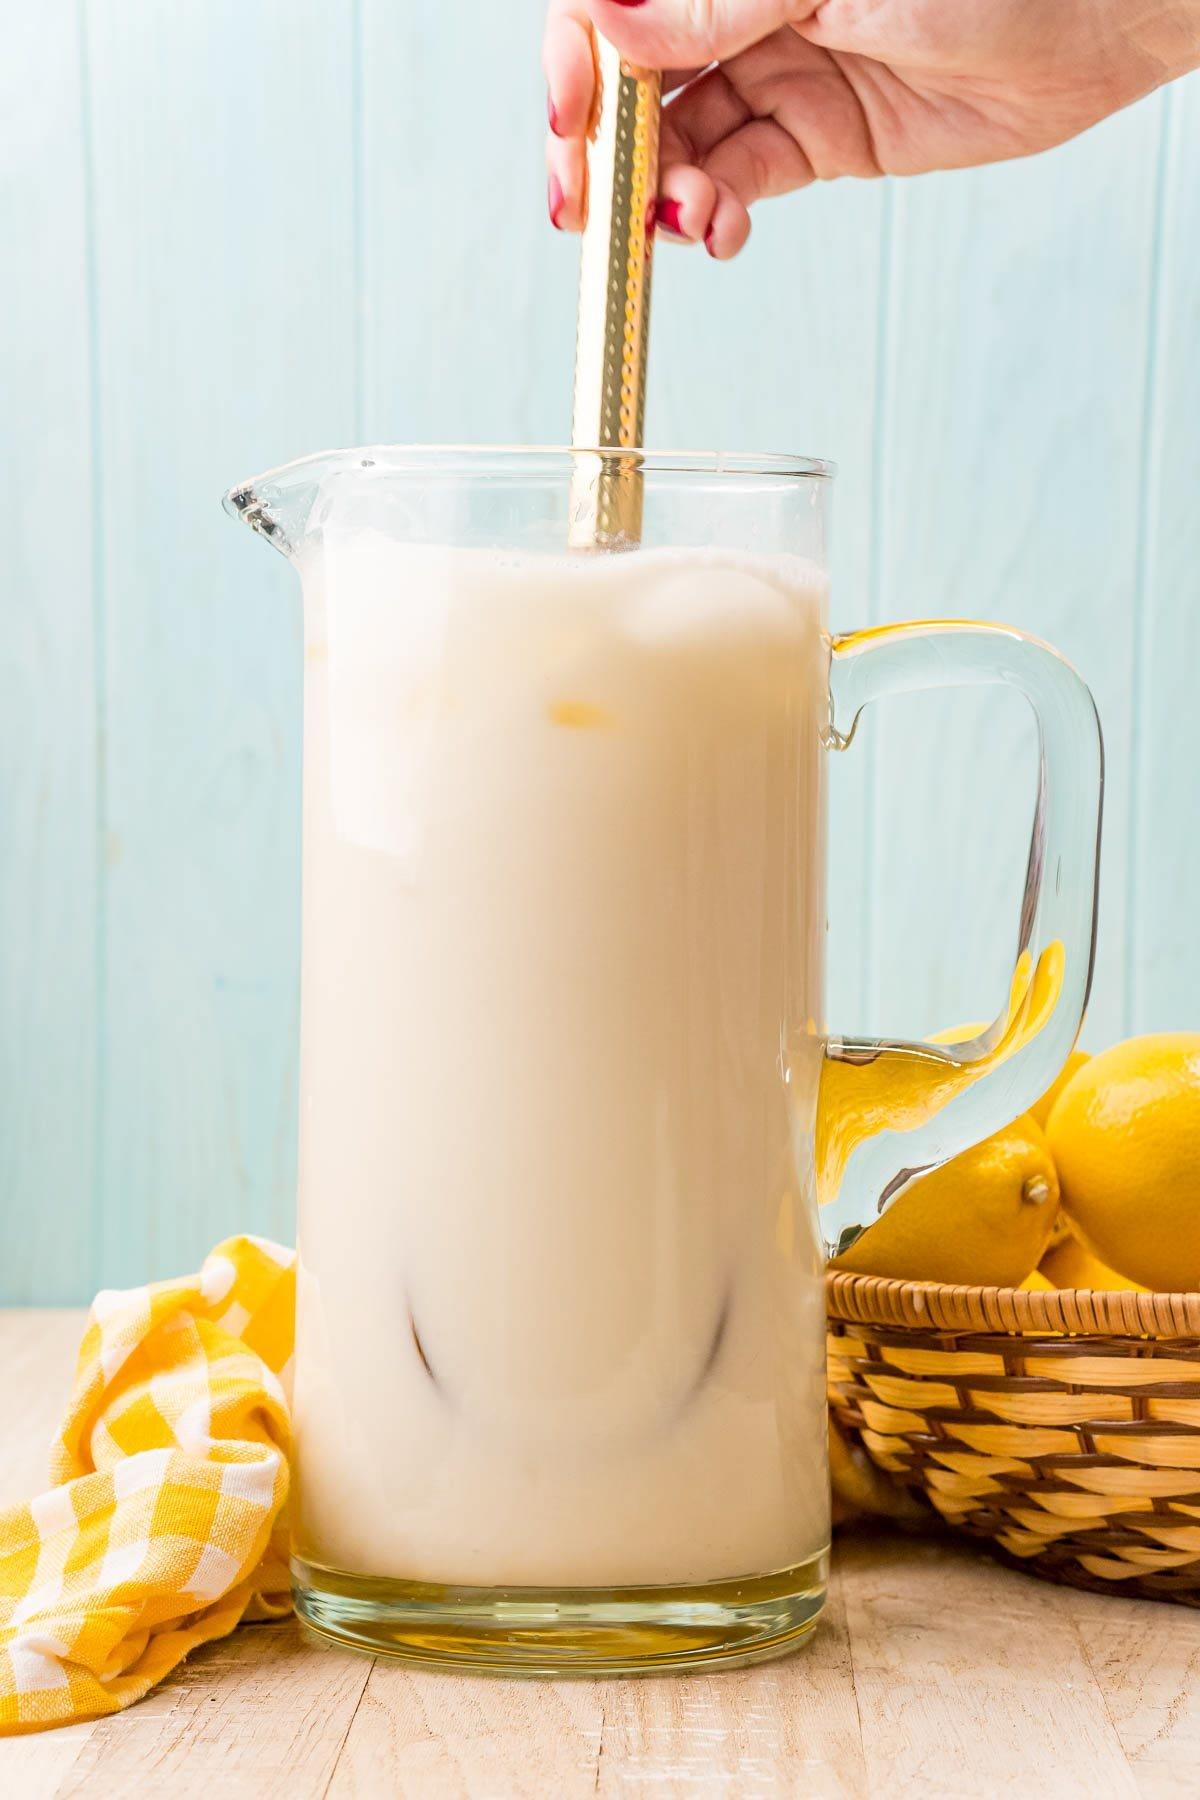 pitcher of creamy lemonade being stirred